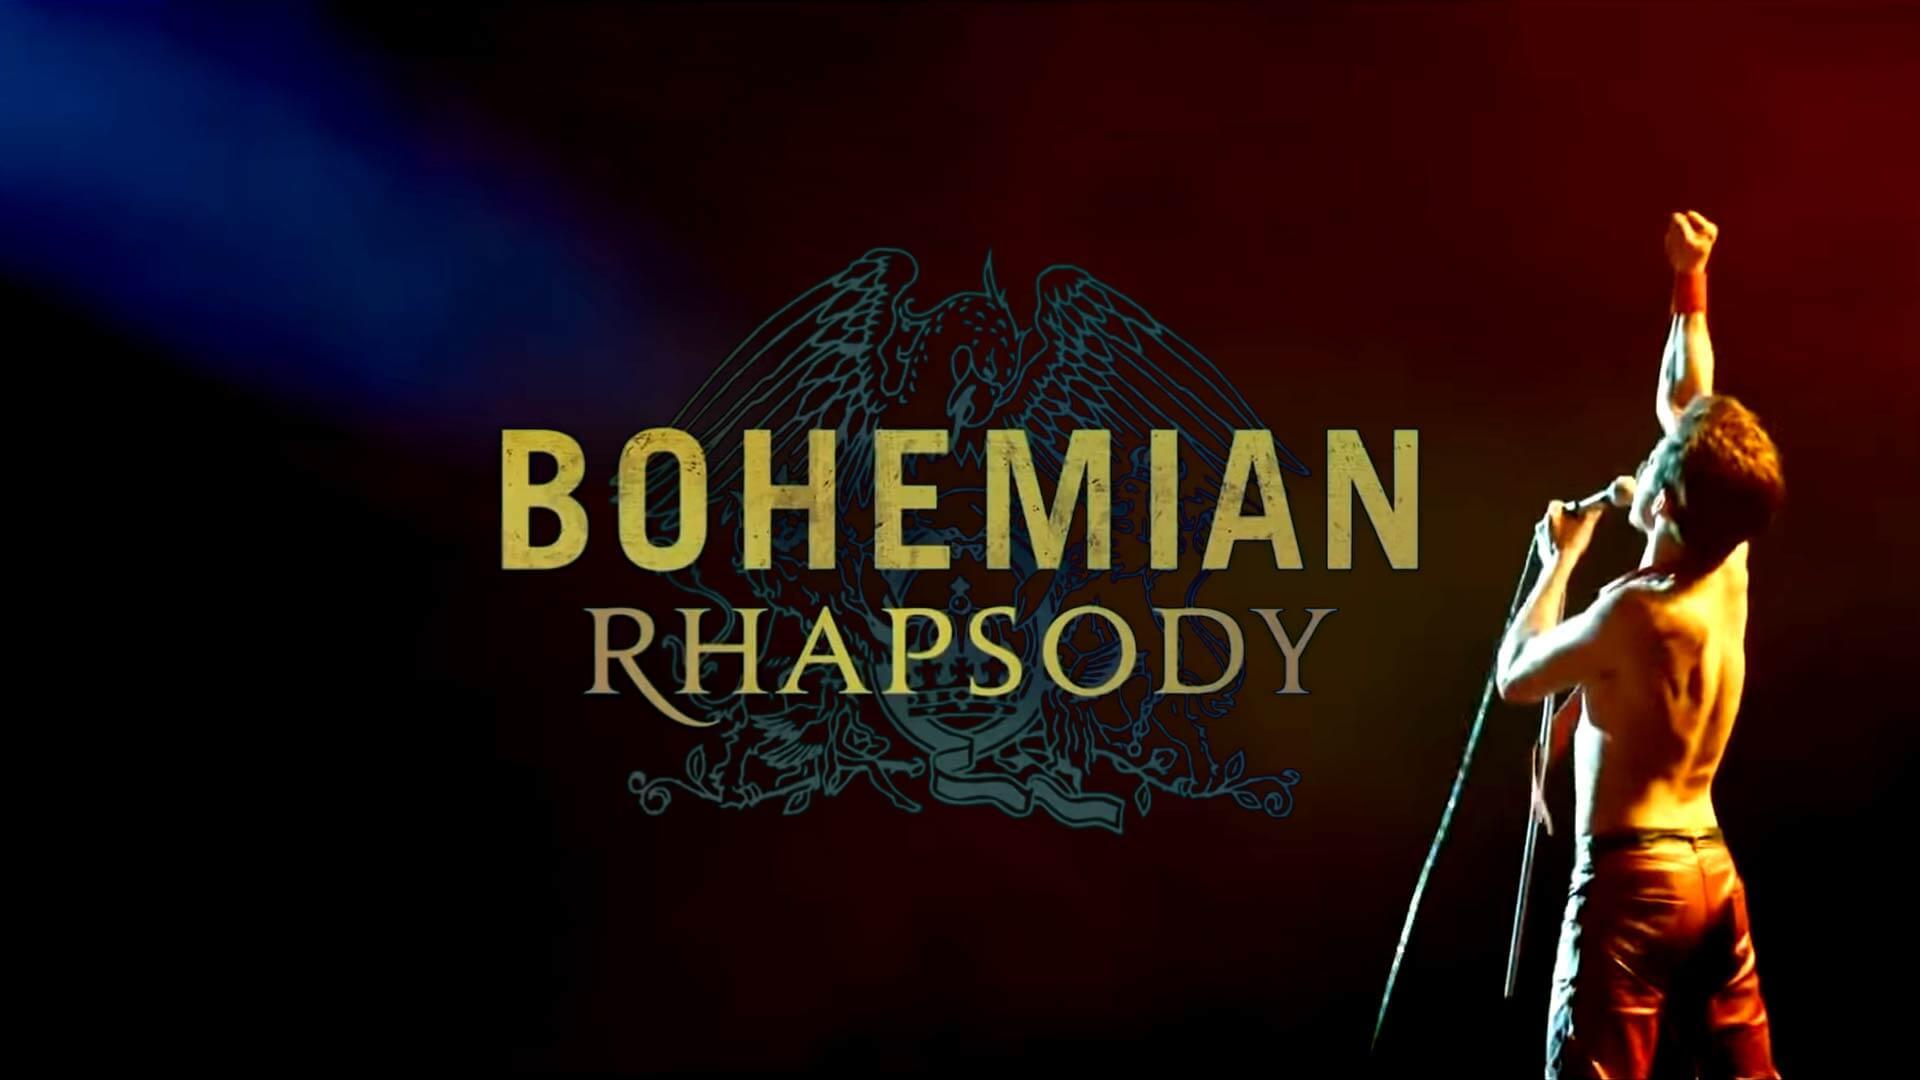 Bohemian Rhapsody freddy mercury